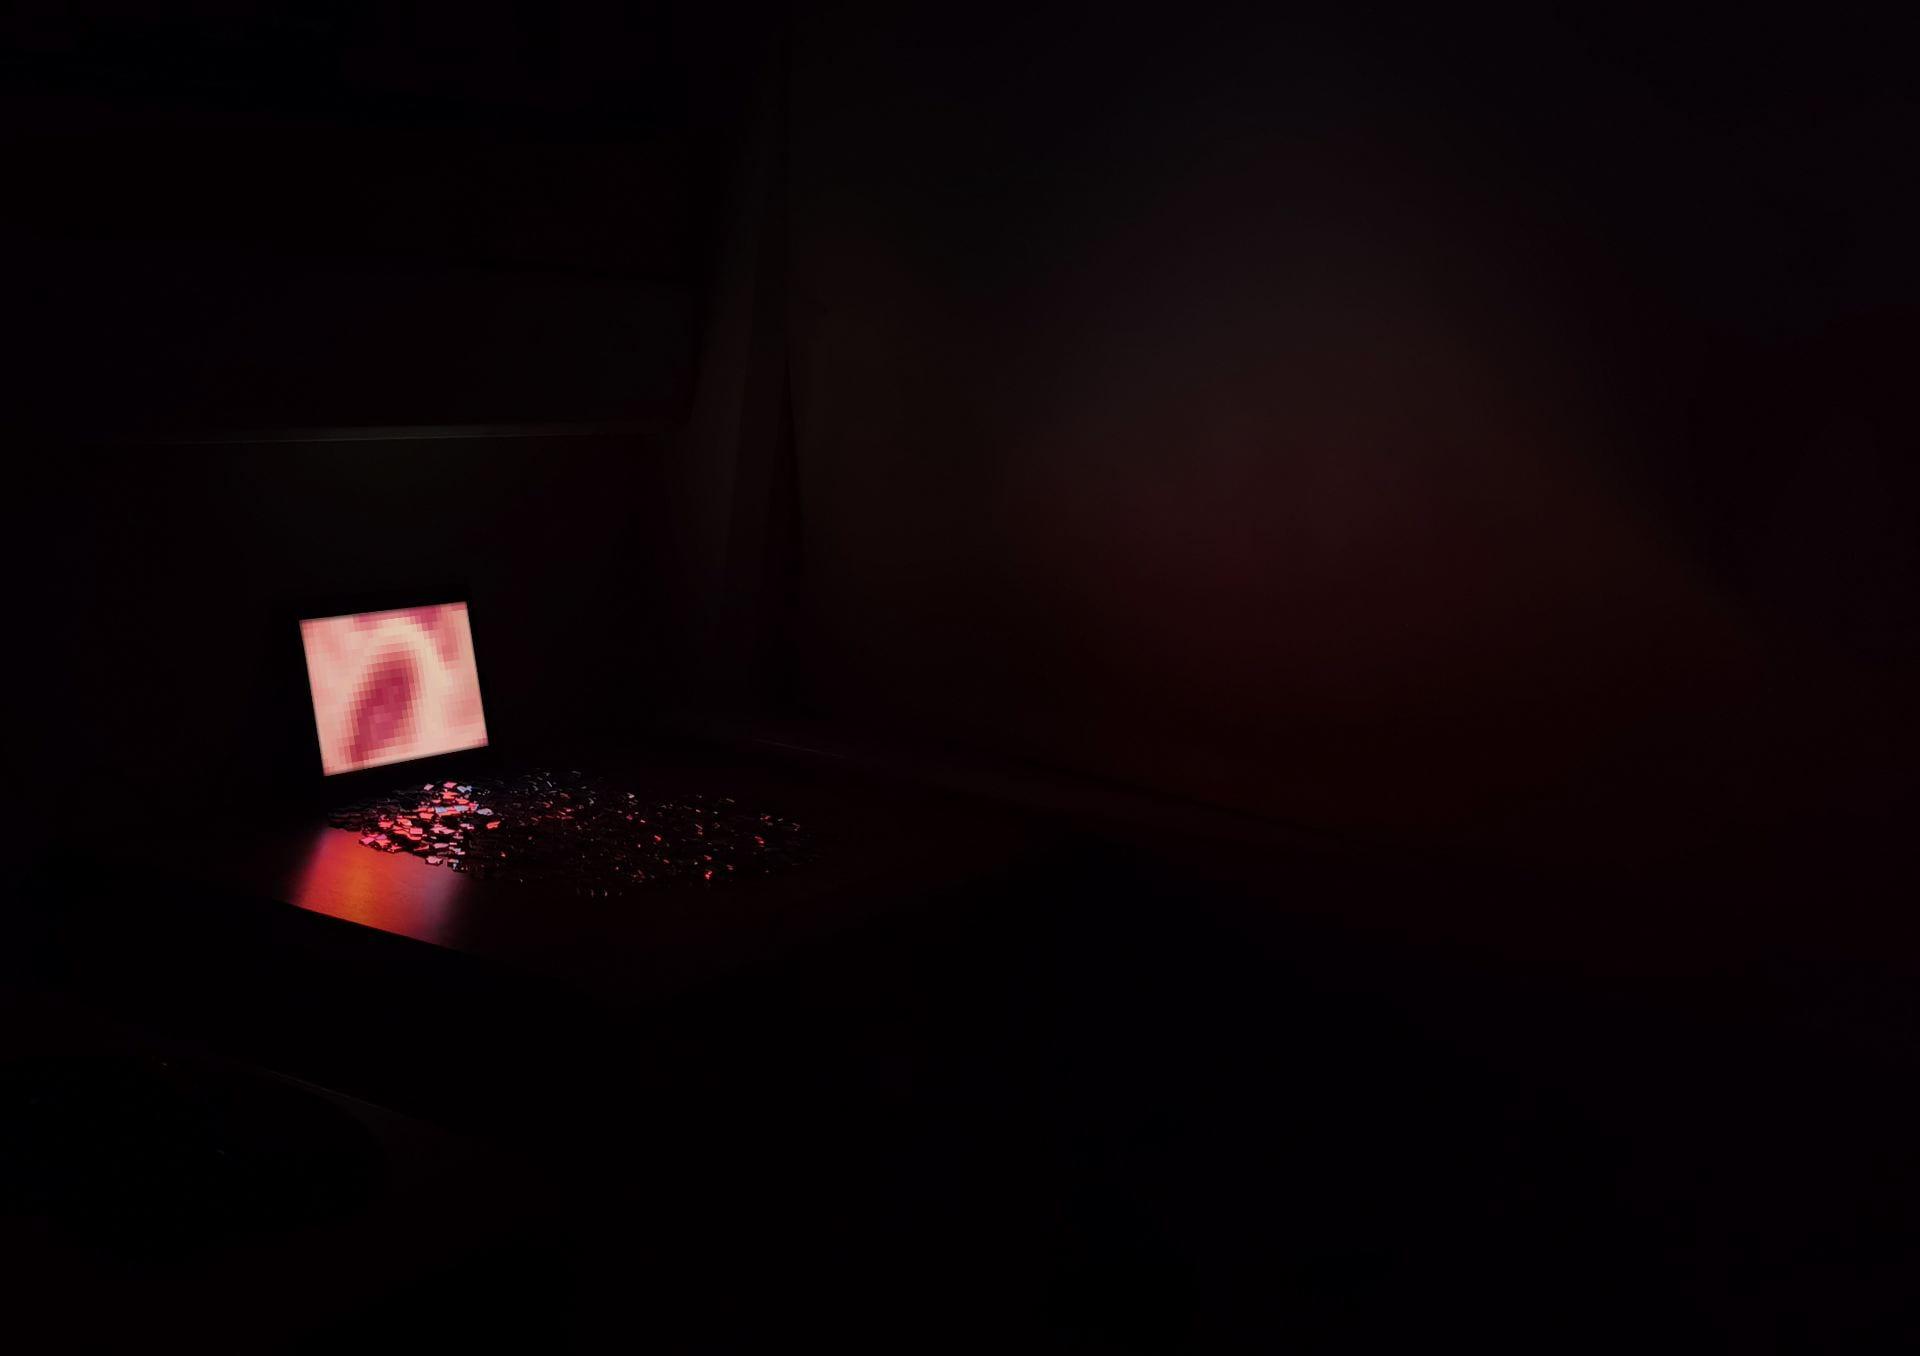 processed digital image